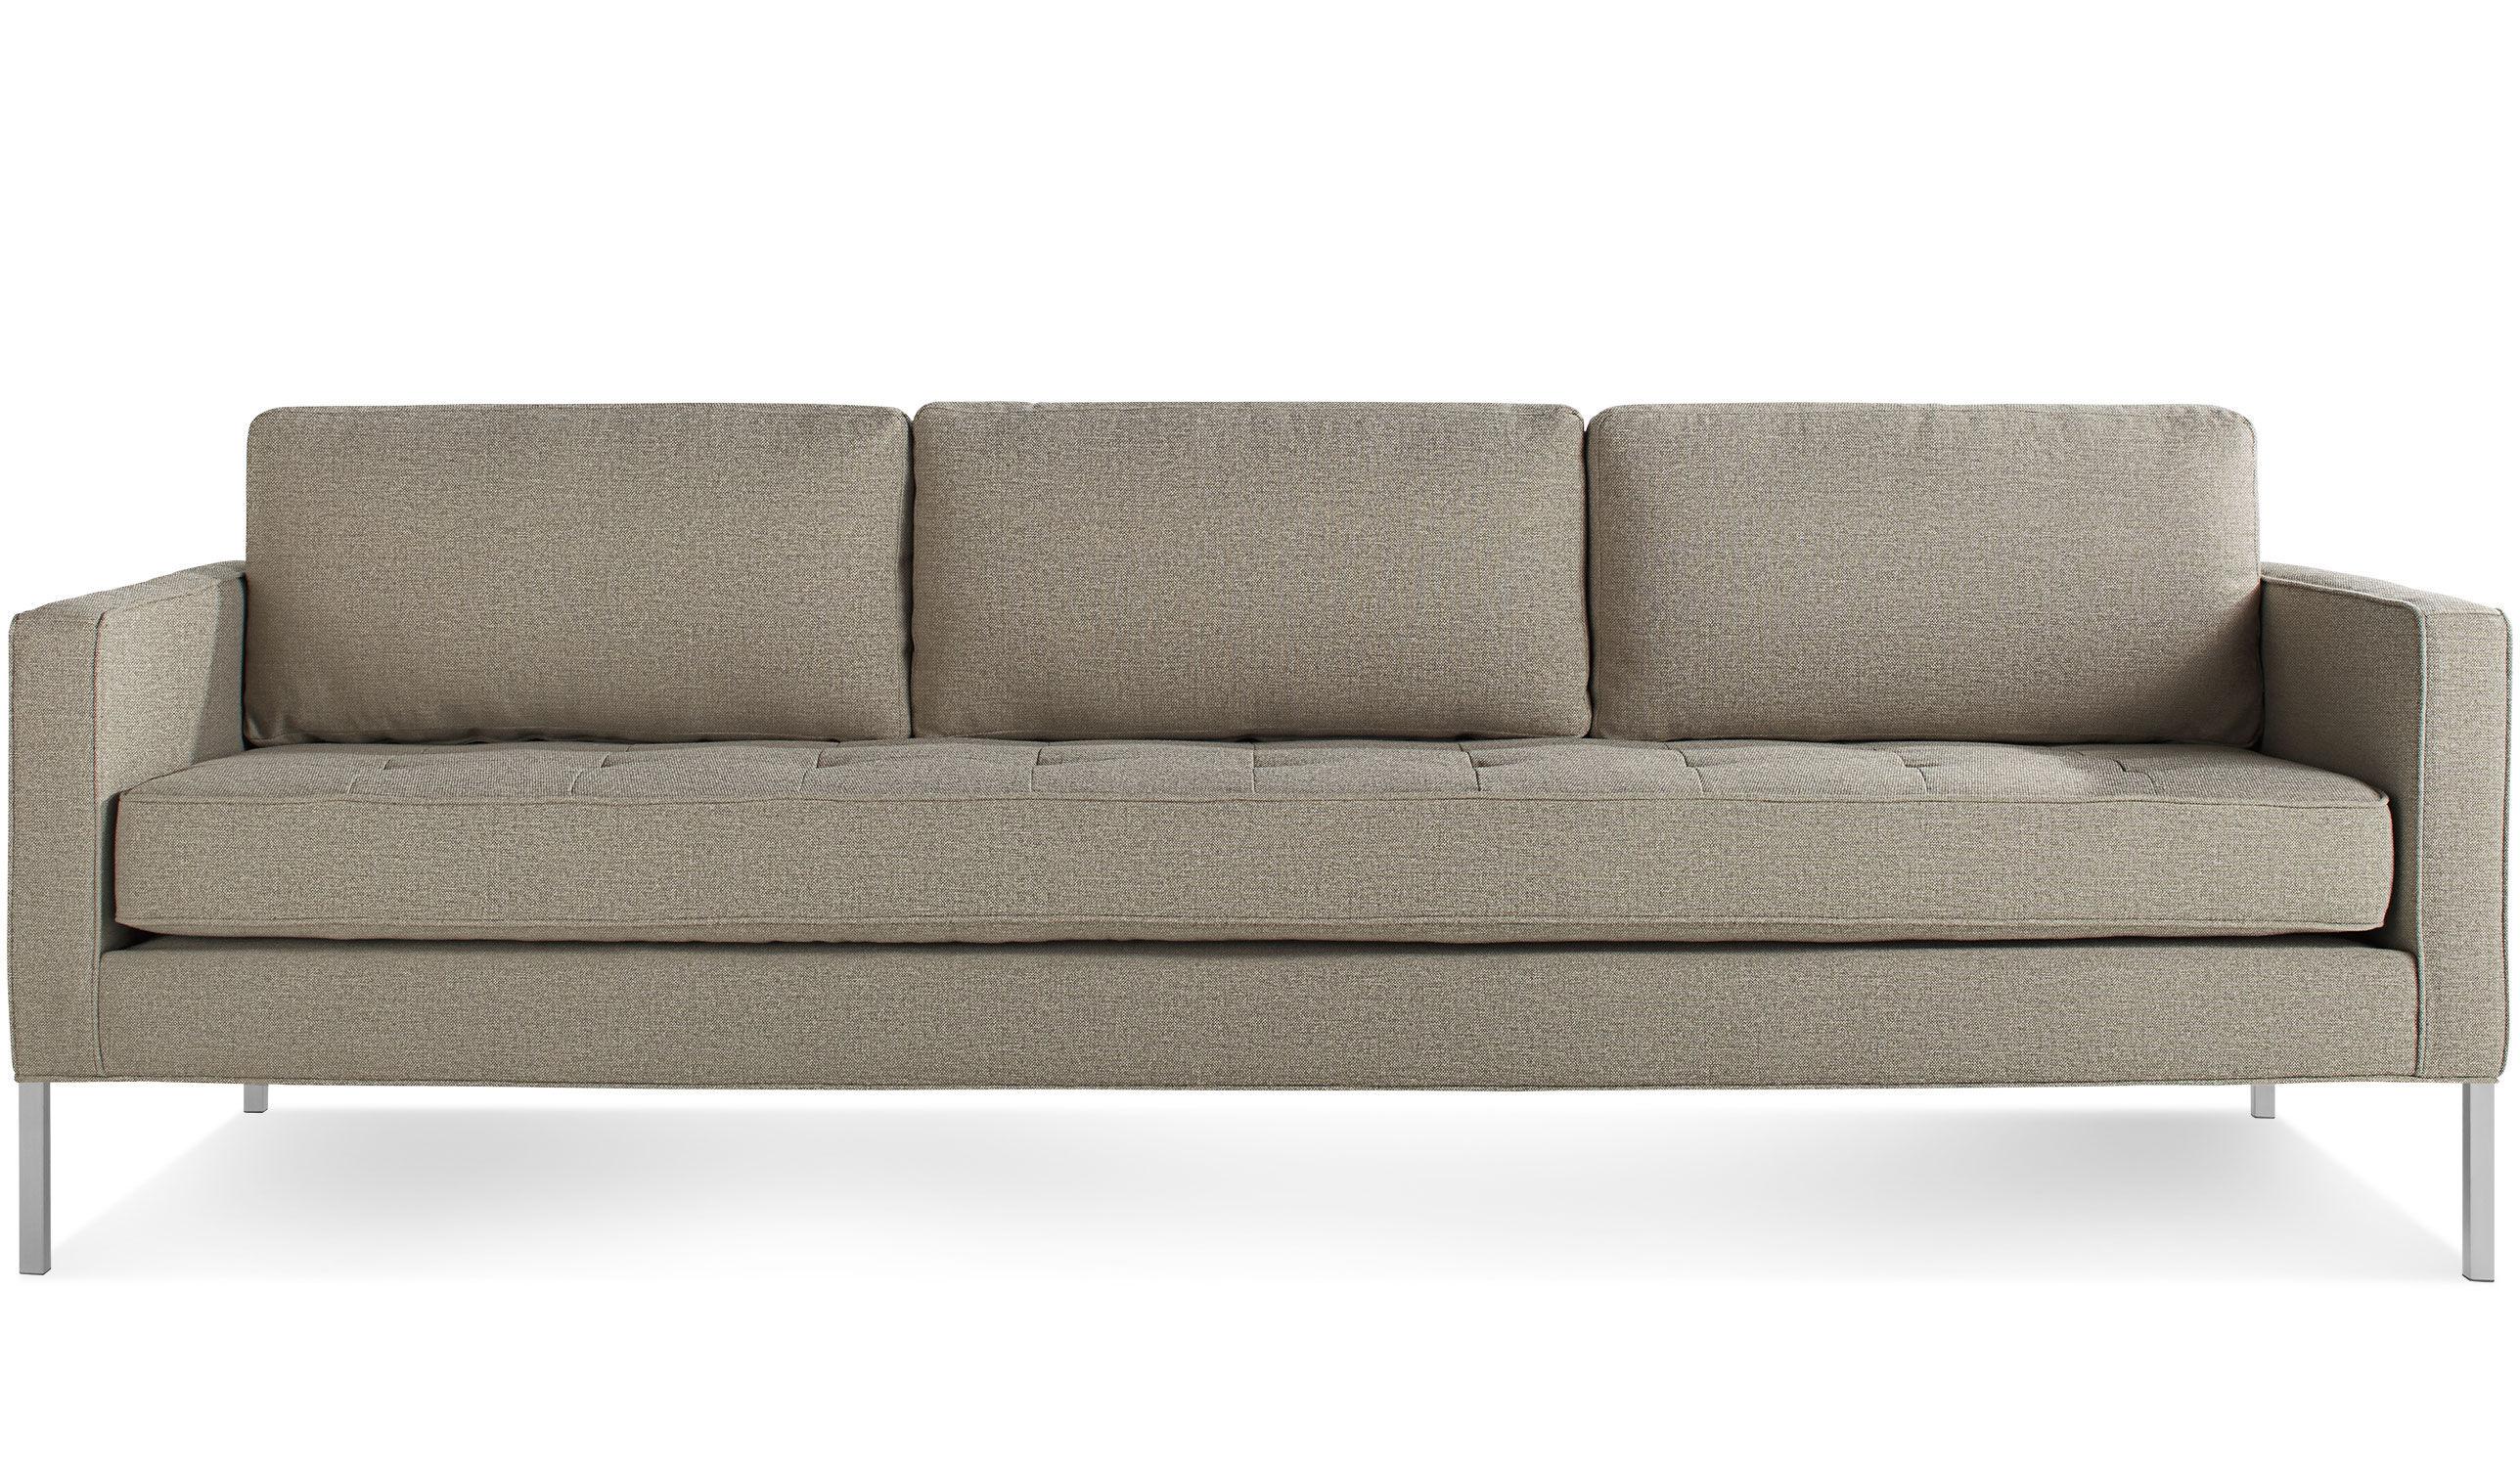 Paramount 95 Inch Sofa